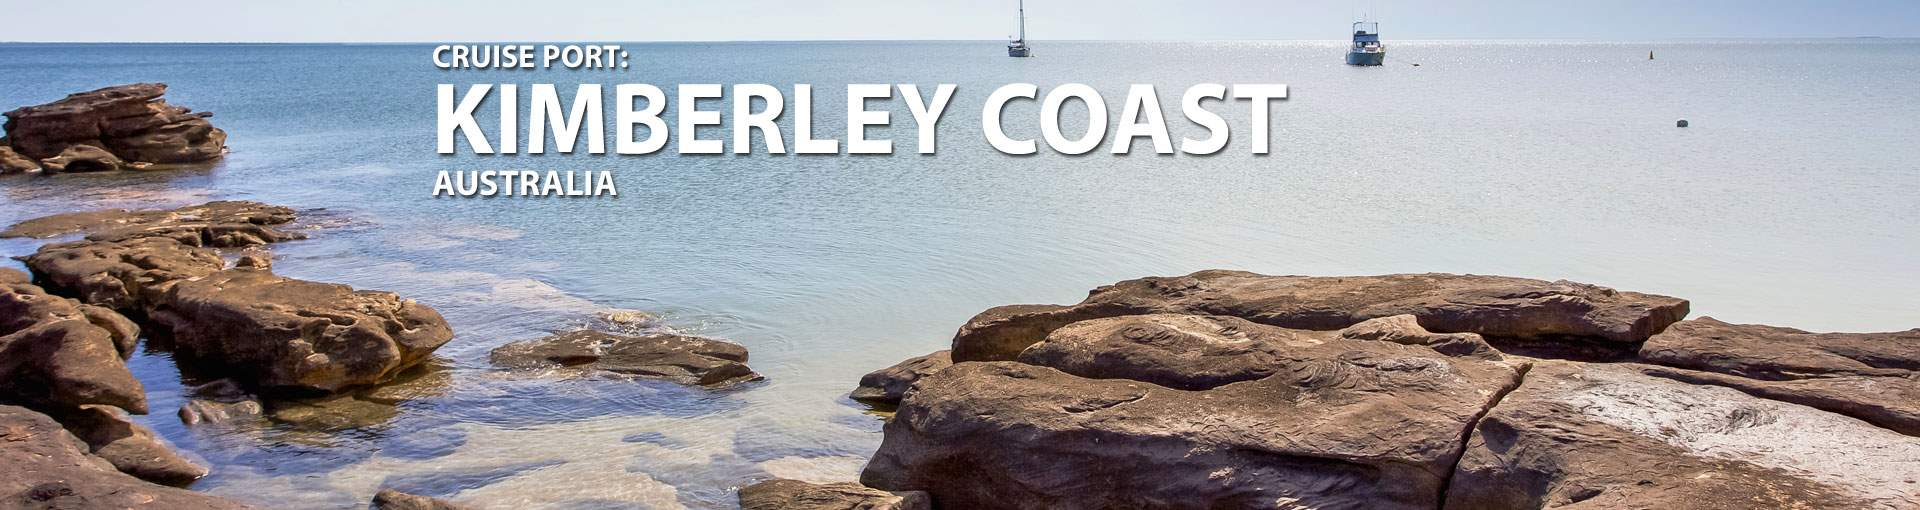 Cruises to Kimberley Coast